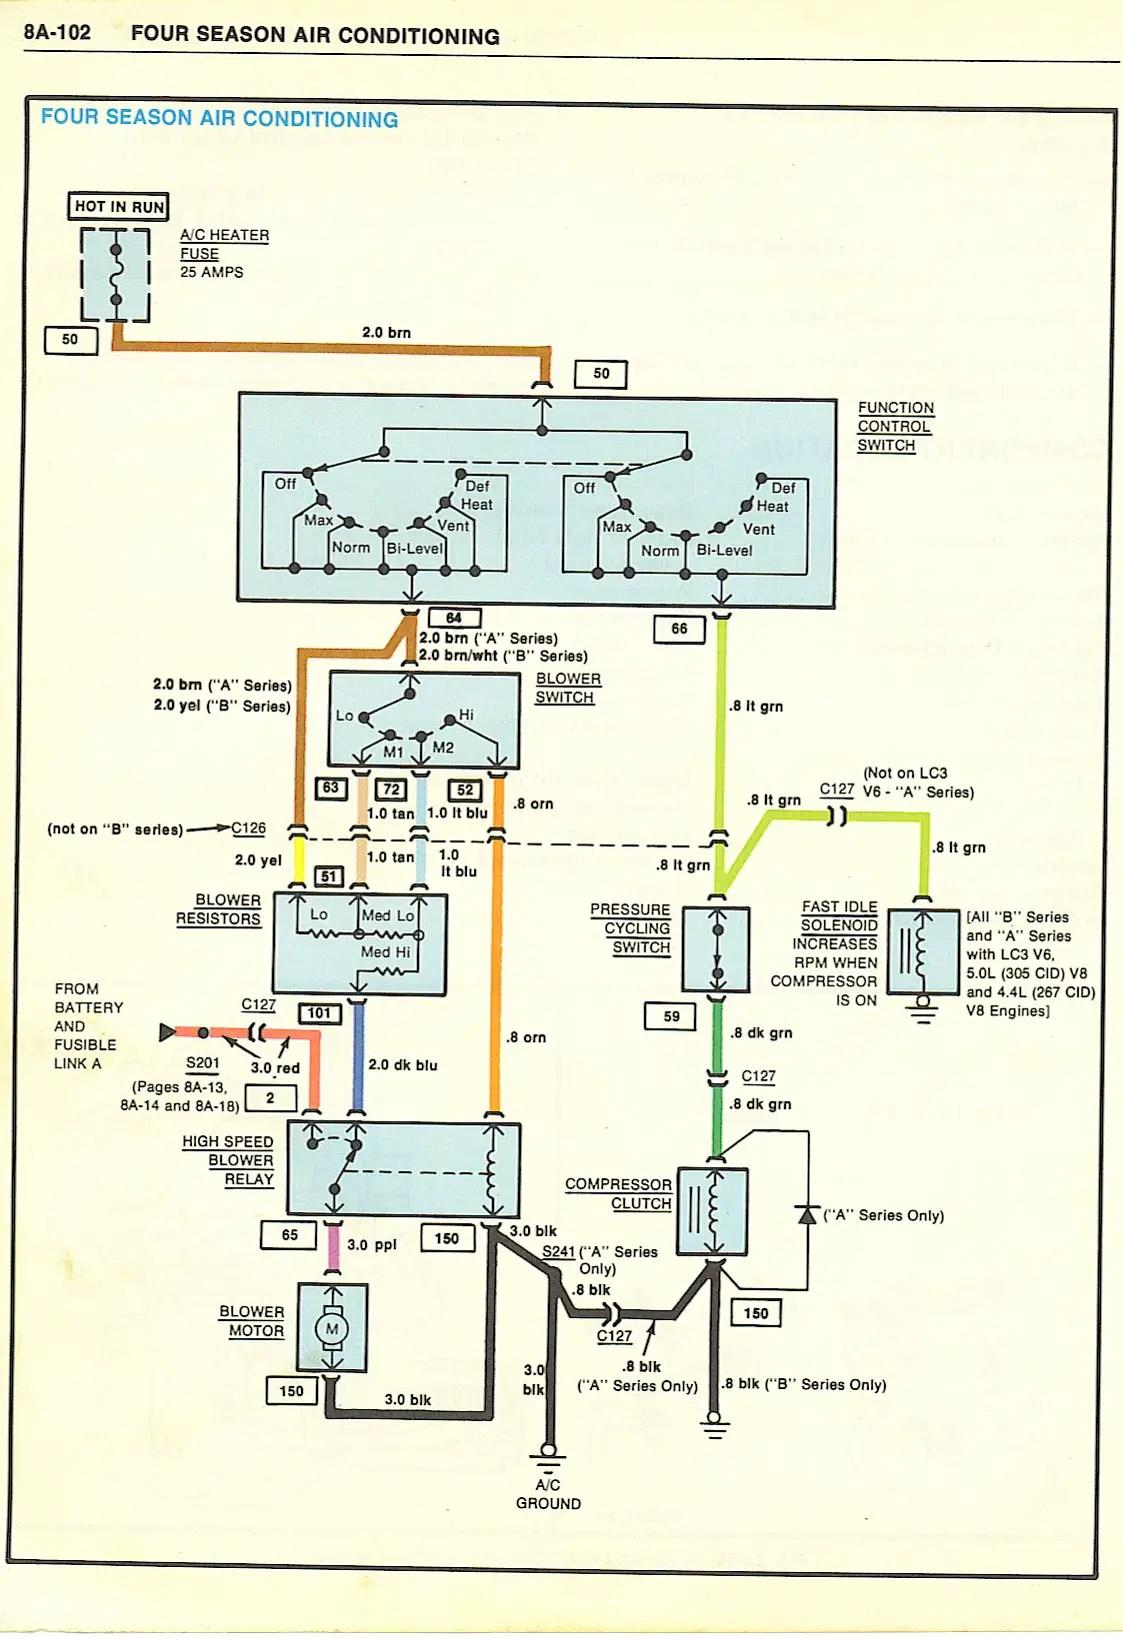 1996 Coleman Mach Rv Air Conditioner